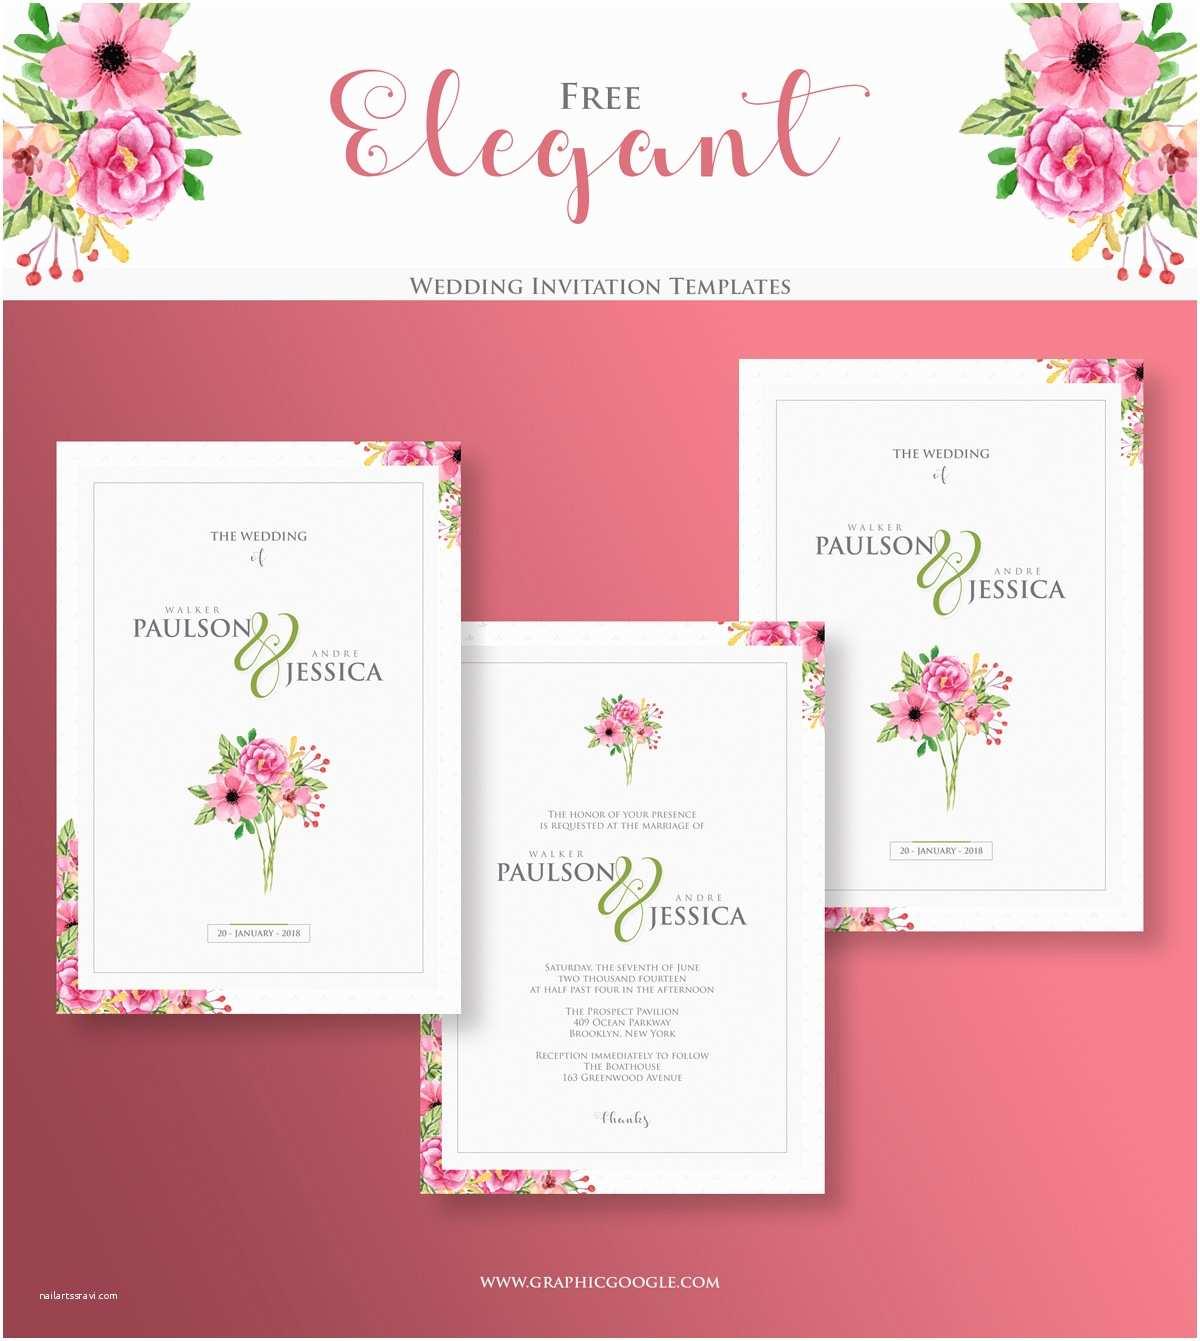 Classy Wedding Invitations Contemporary Elegant Invitation Templates Image Collection